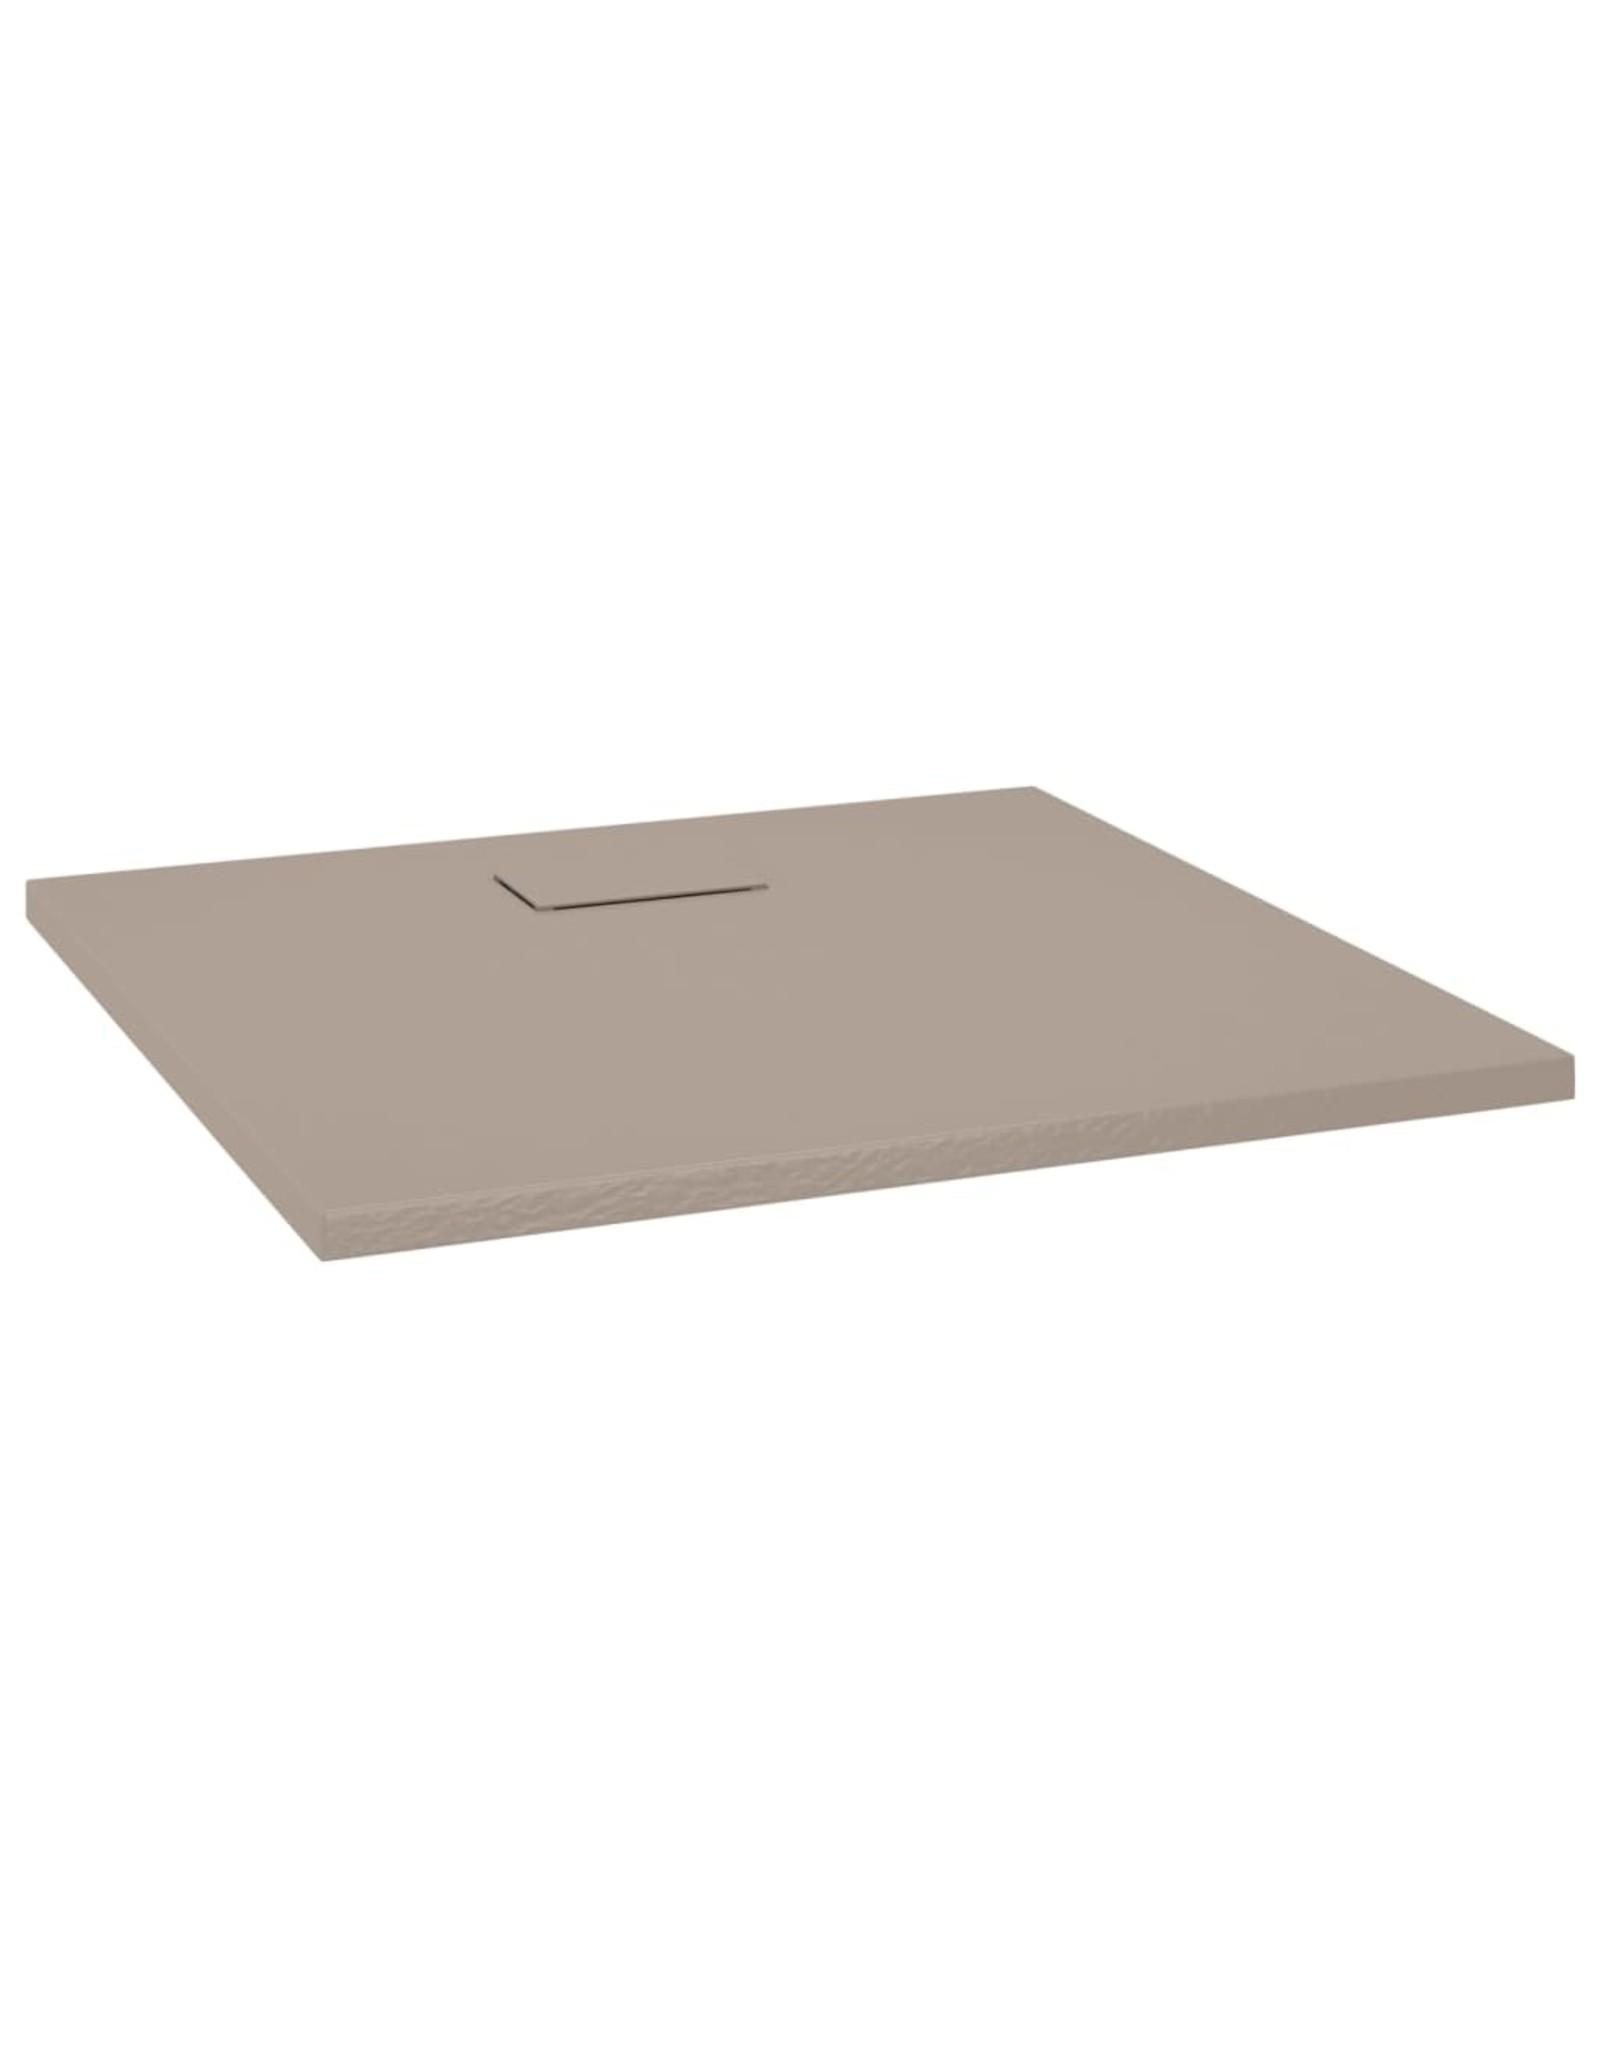 Douchebak 90x80 cm SMC bruin